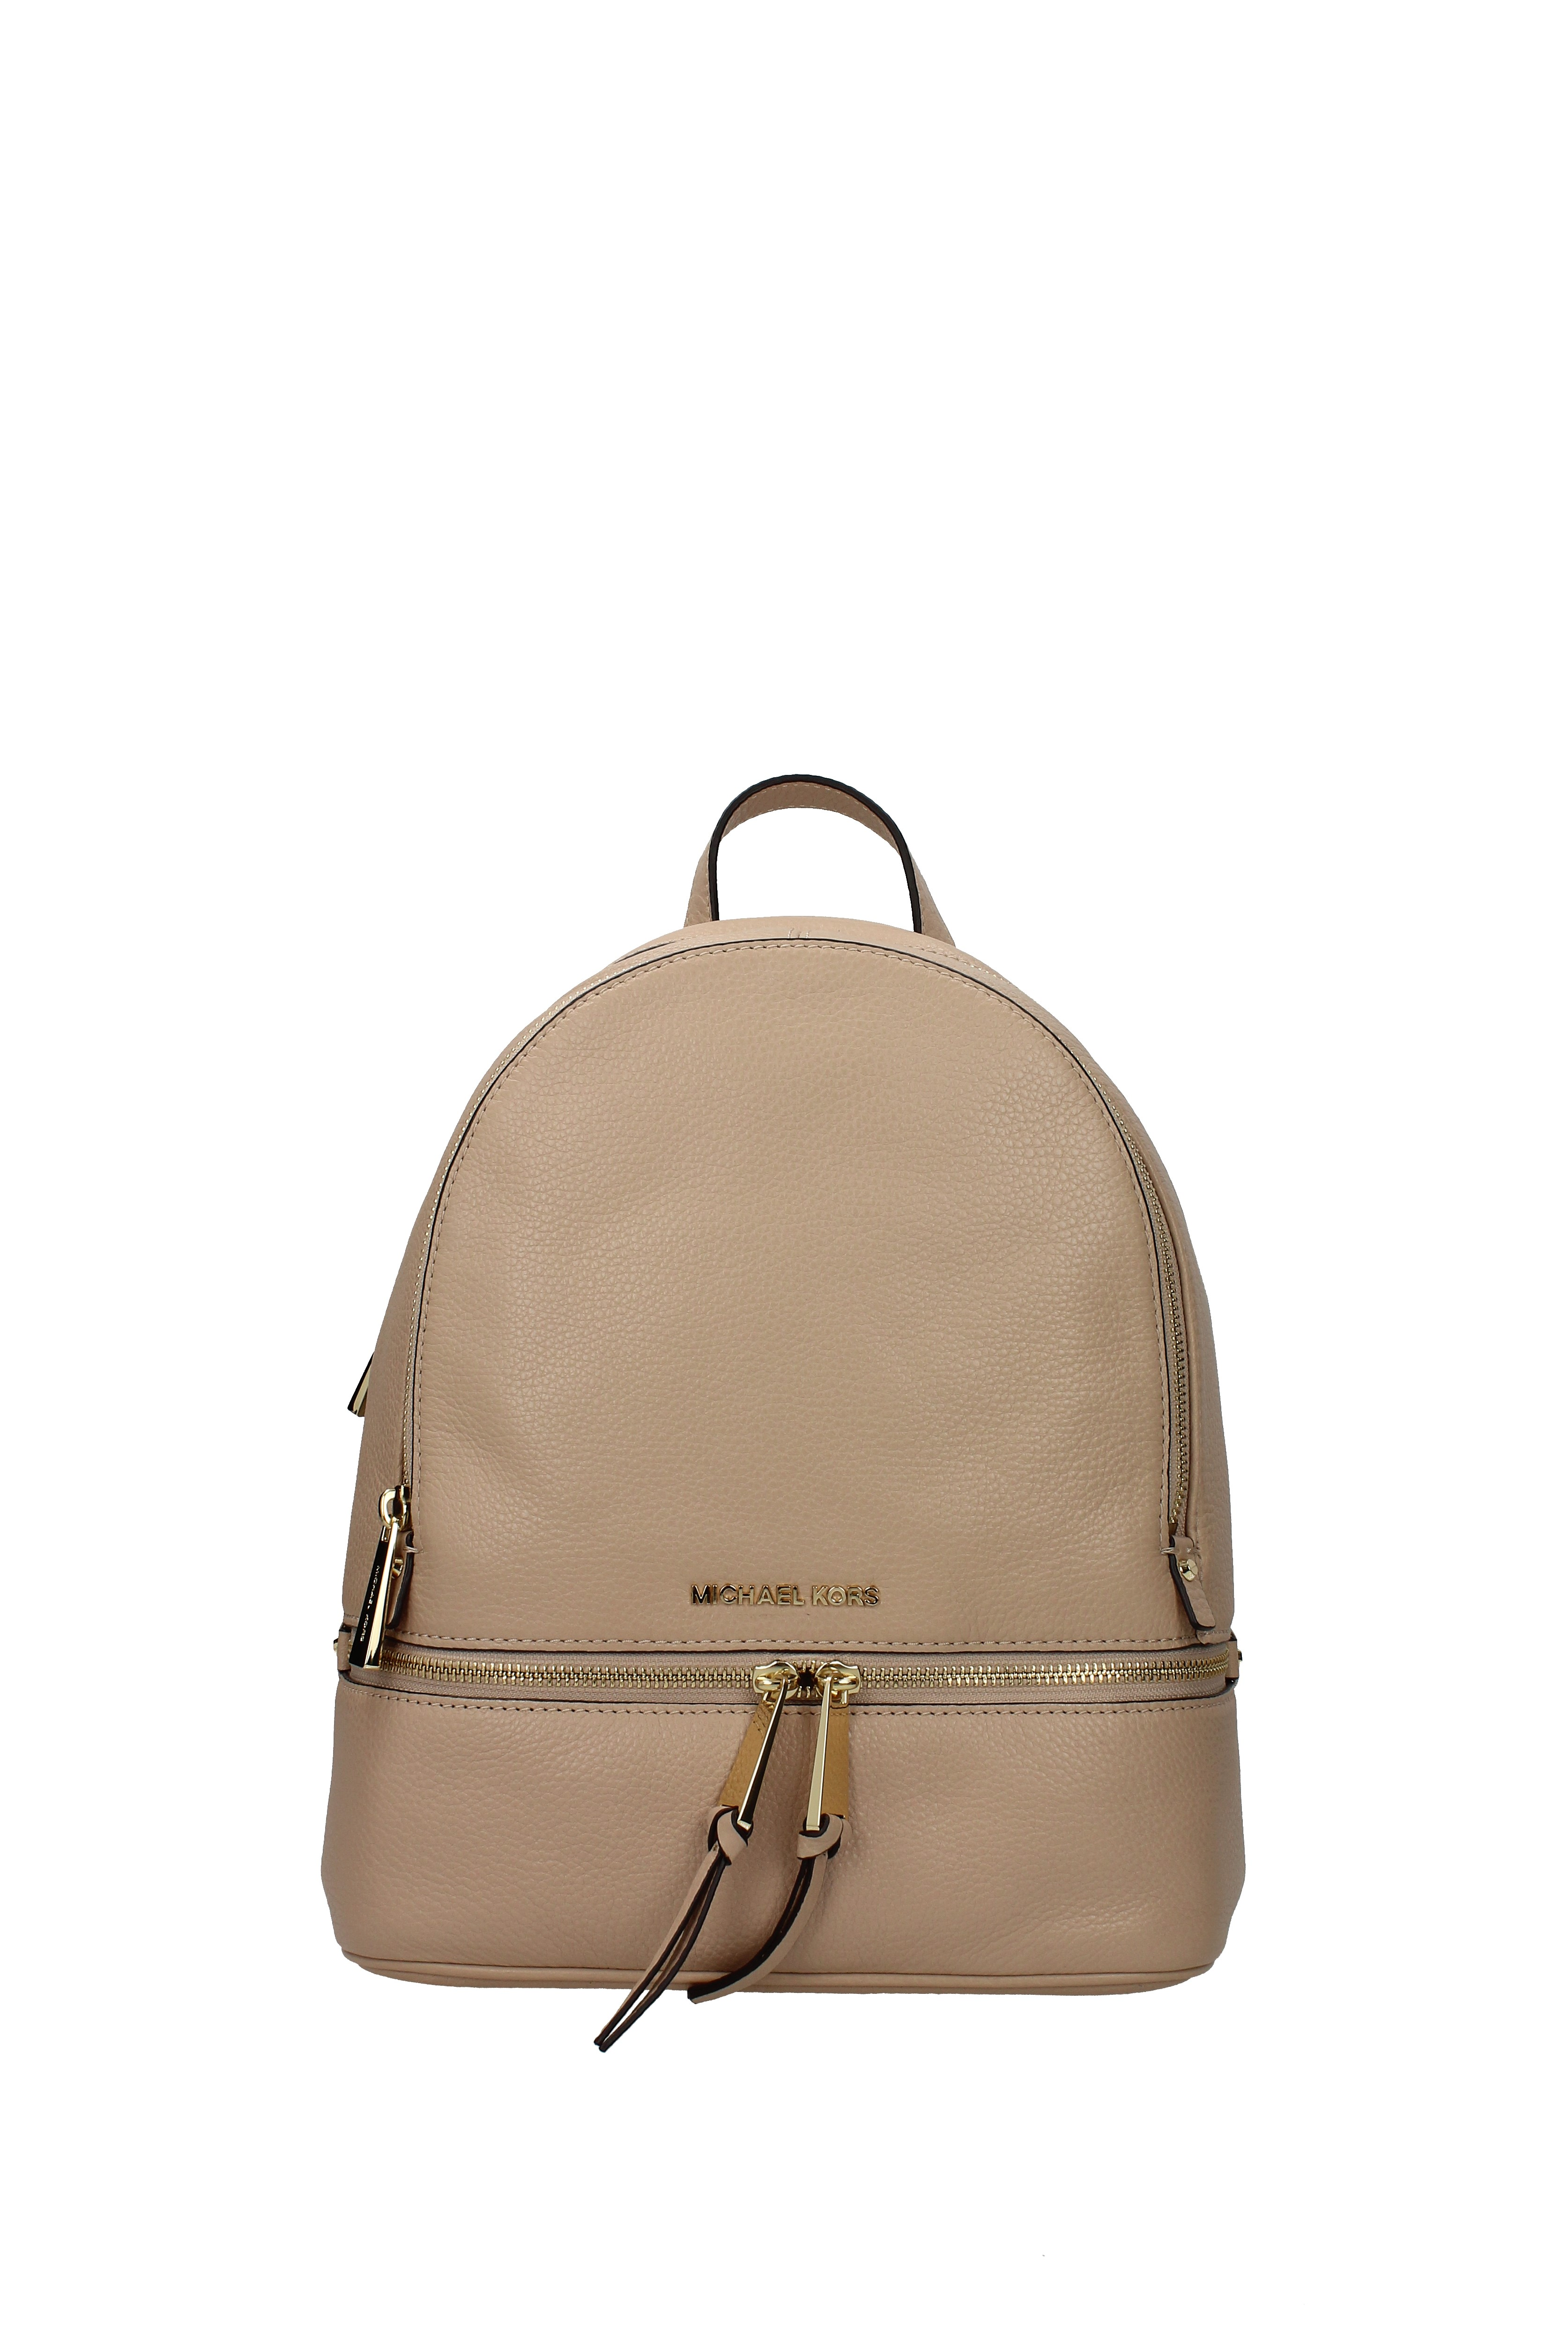 756c50842c18 Backpacks and bumbags Michael Kors rhea zip md Women - Leather ...